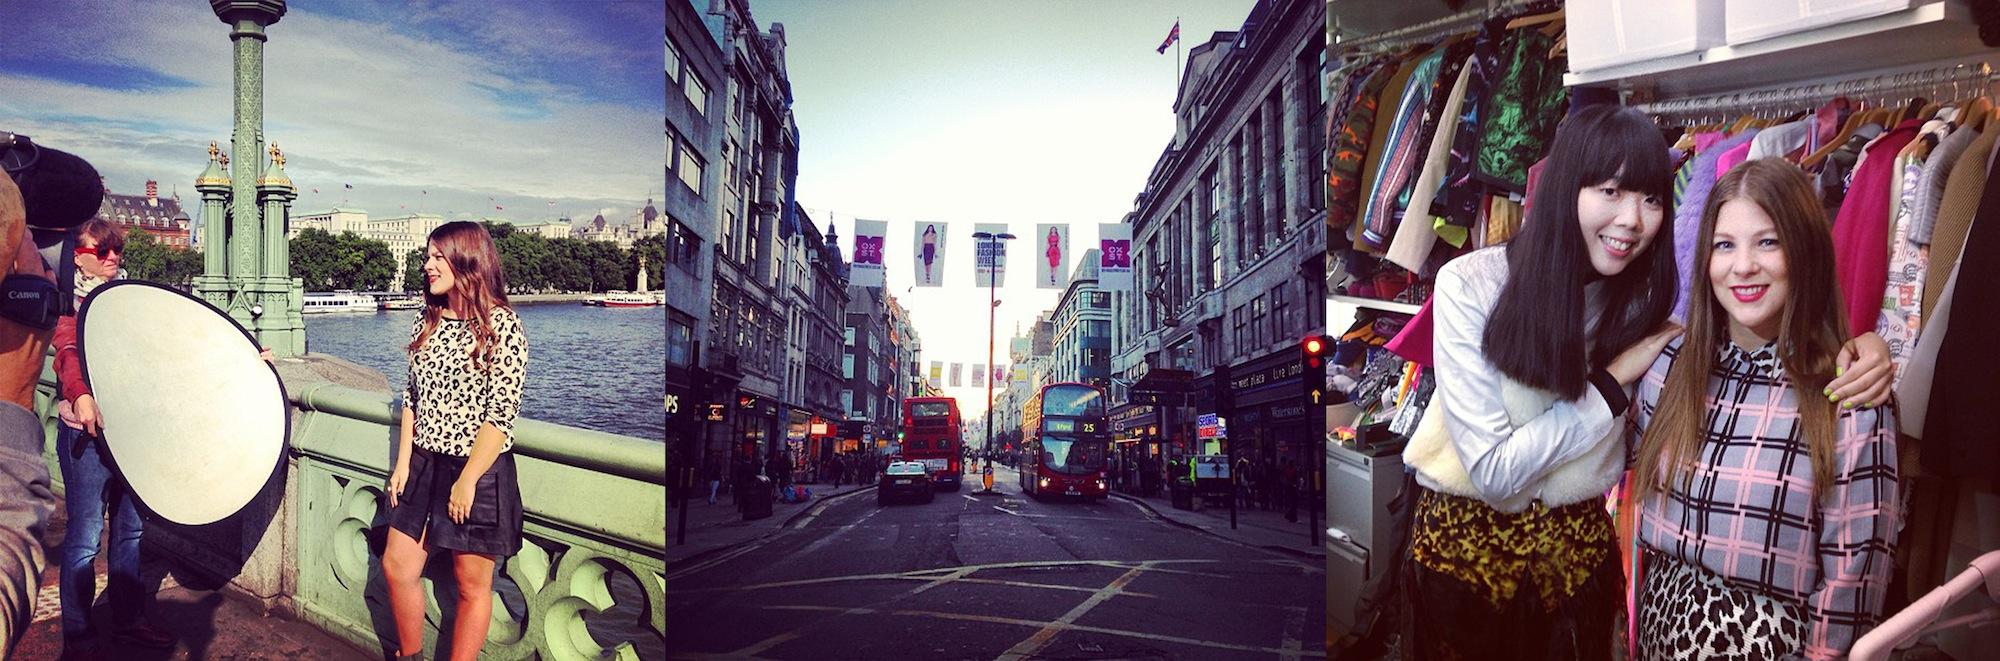 itsfashiontv_london